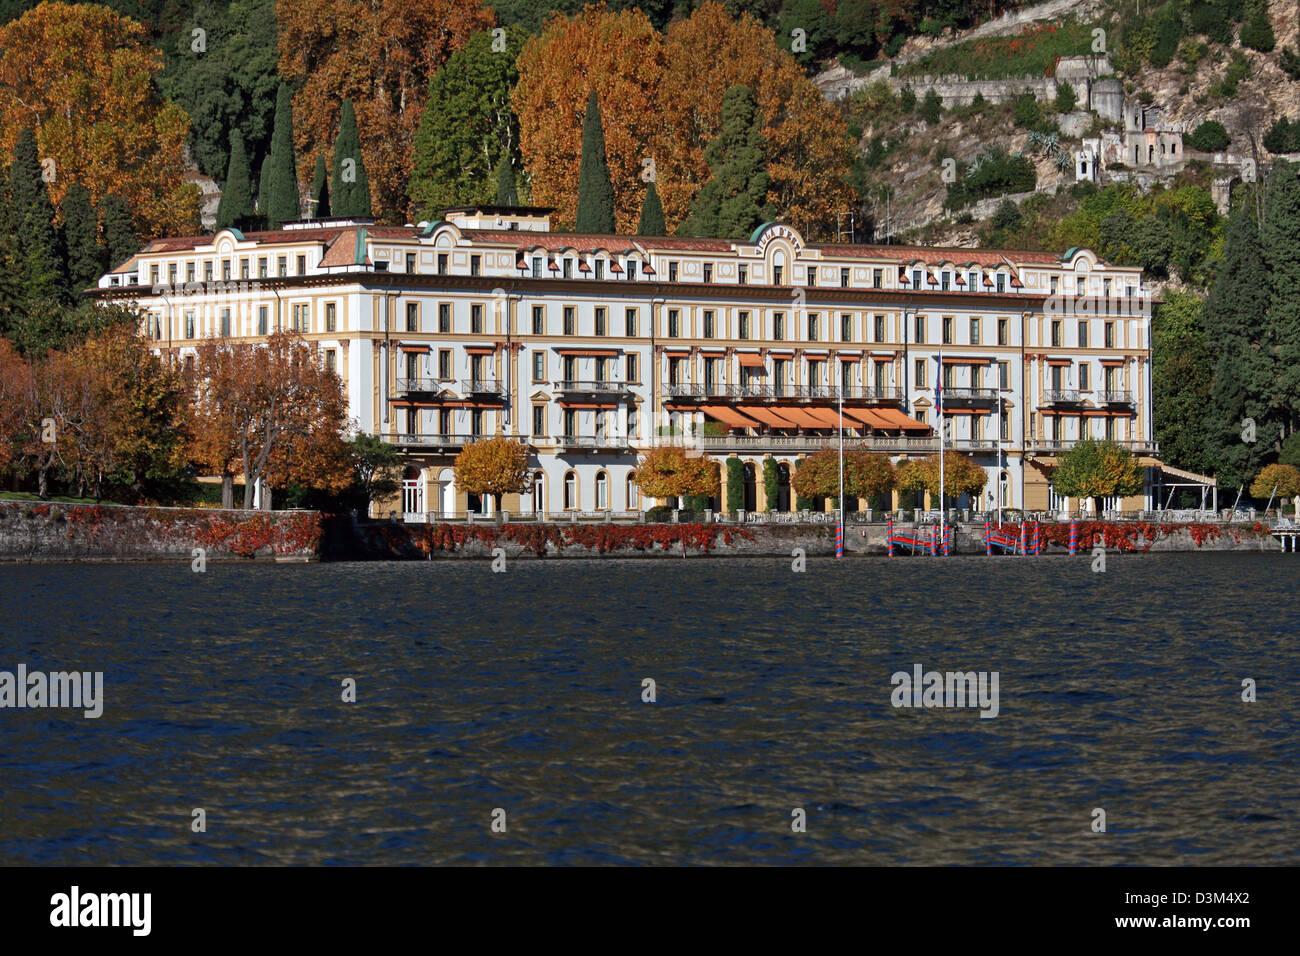 Italy, Lombardy, Lake Como Villa d'Este - Luxury Hotel - Stock Image